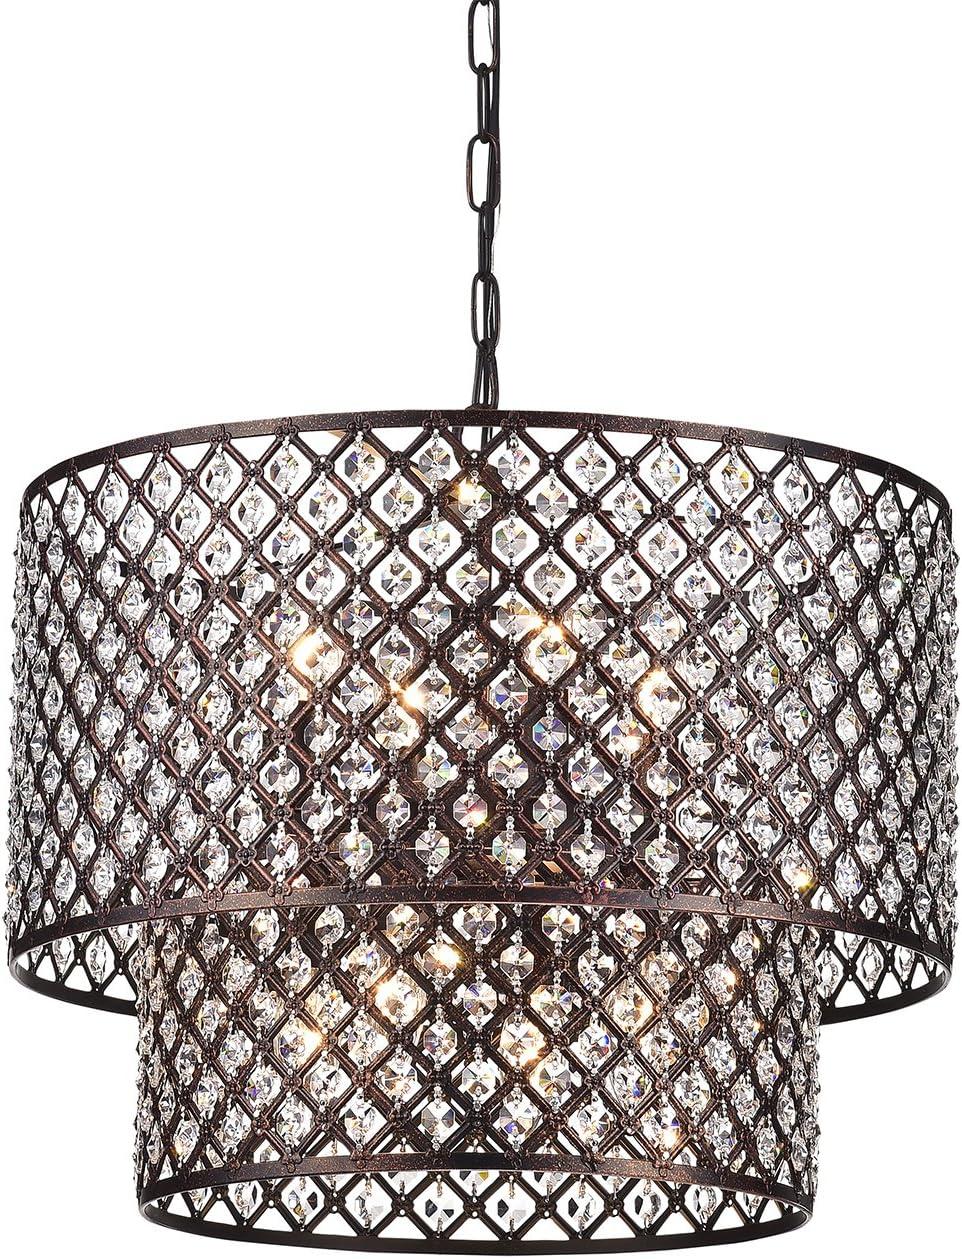 Antique Copper 2 Round Drum Shades 8-Light Crystal Chandelier Ceiling Fixture